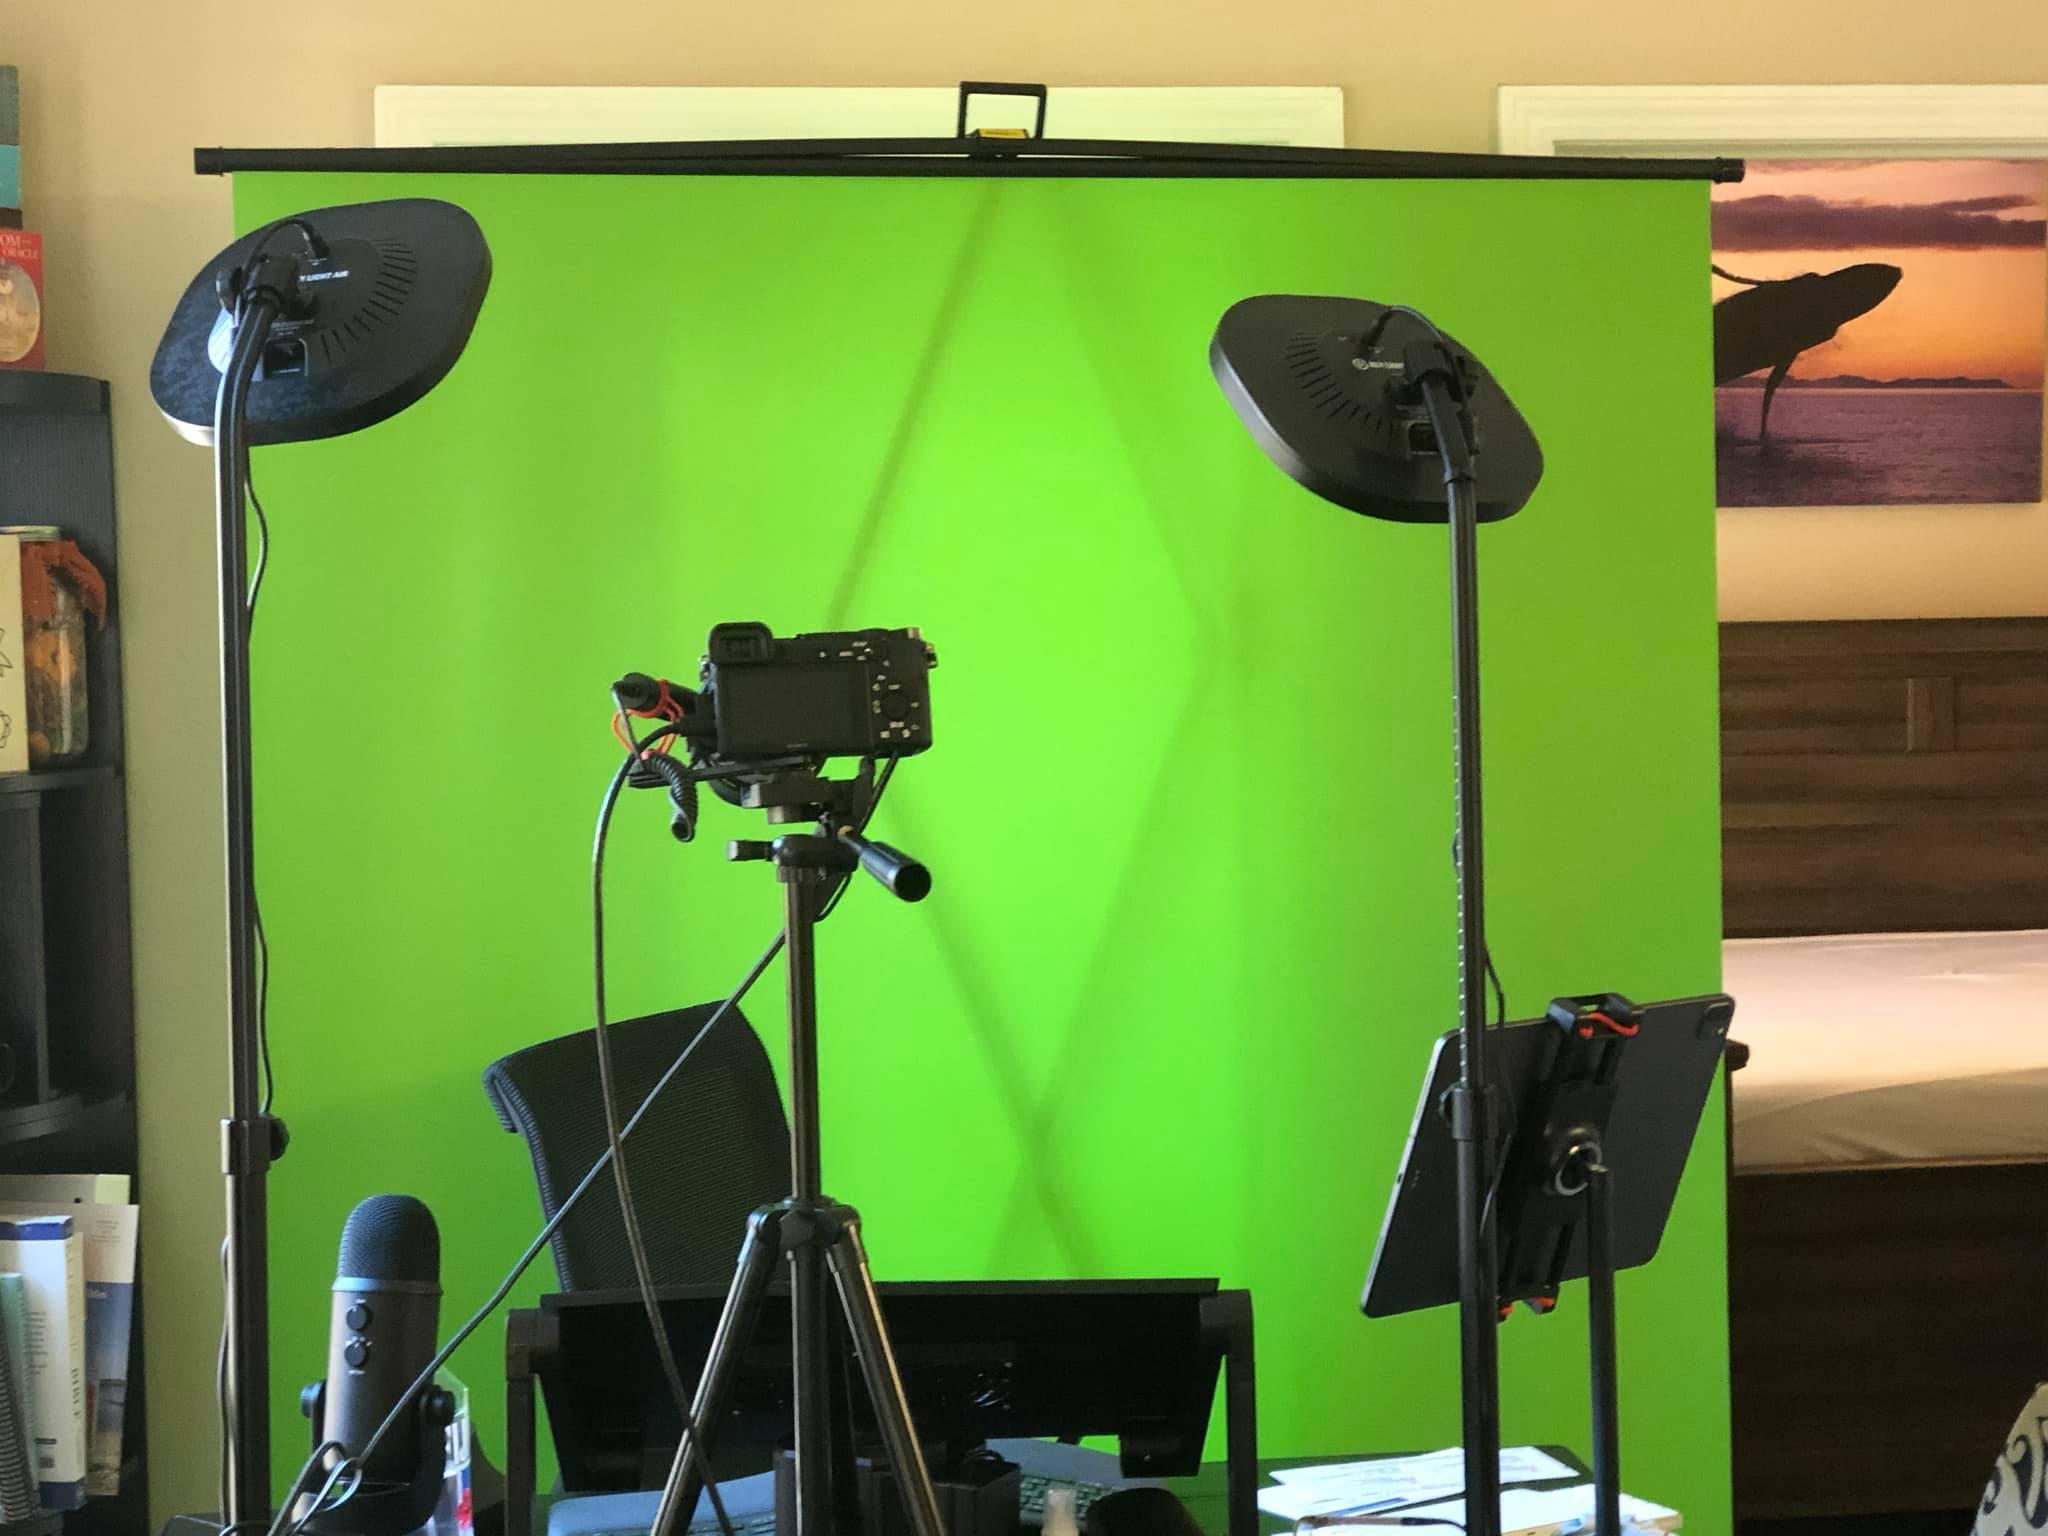 youtube studio with greenscreen, keylights, video camera, recording equipment